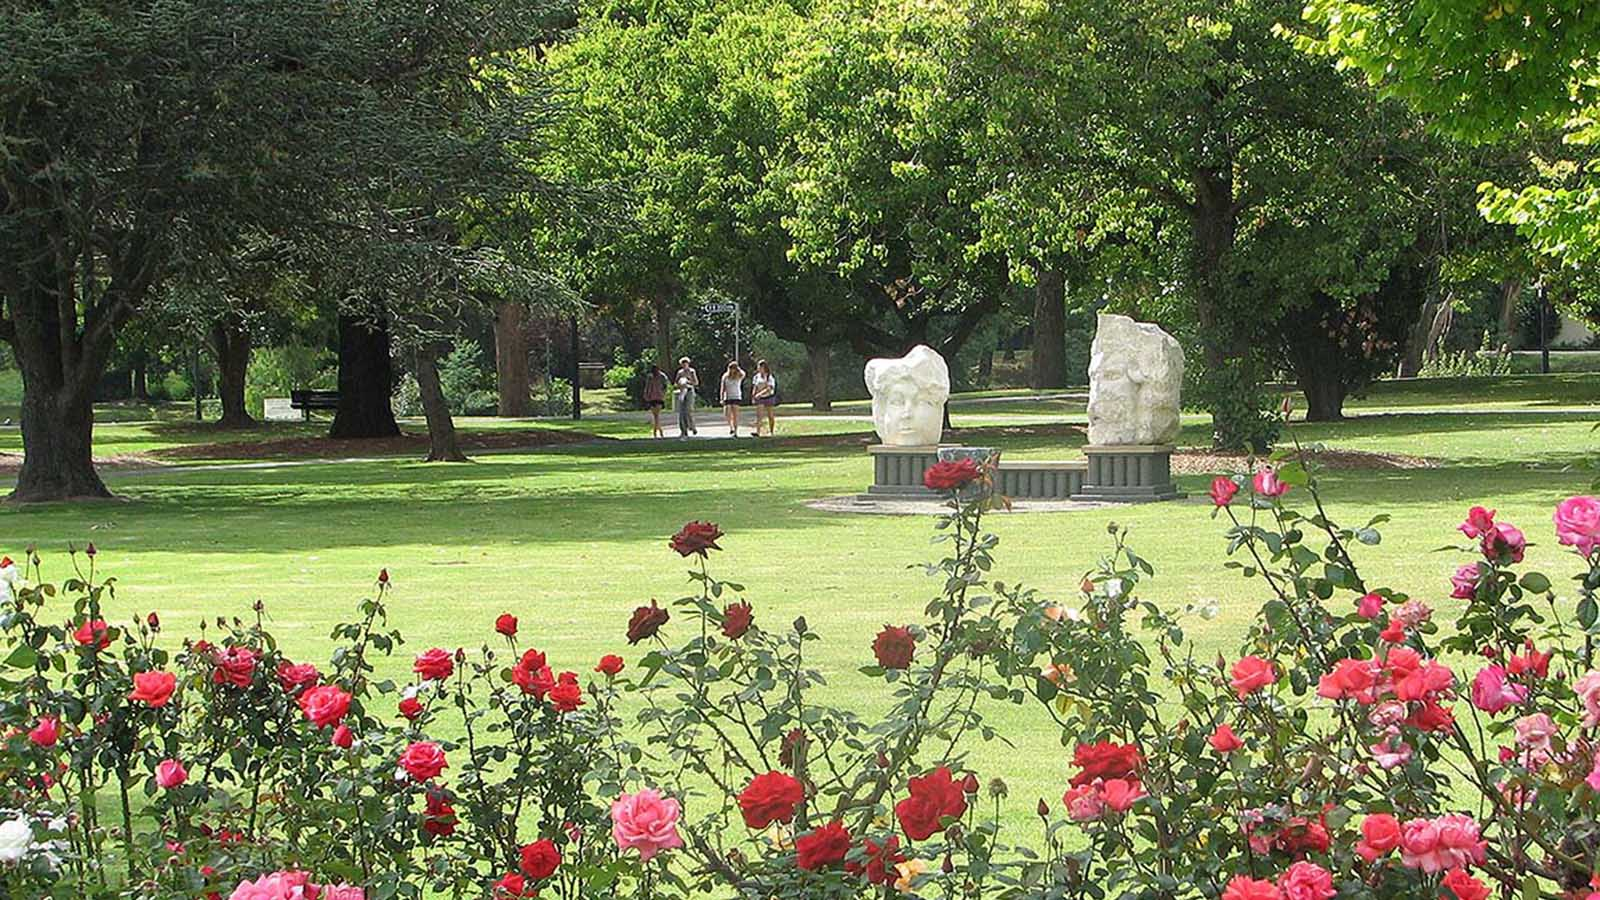 Victory Park, Gippsland, Victoria, Australia